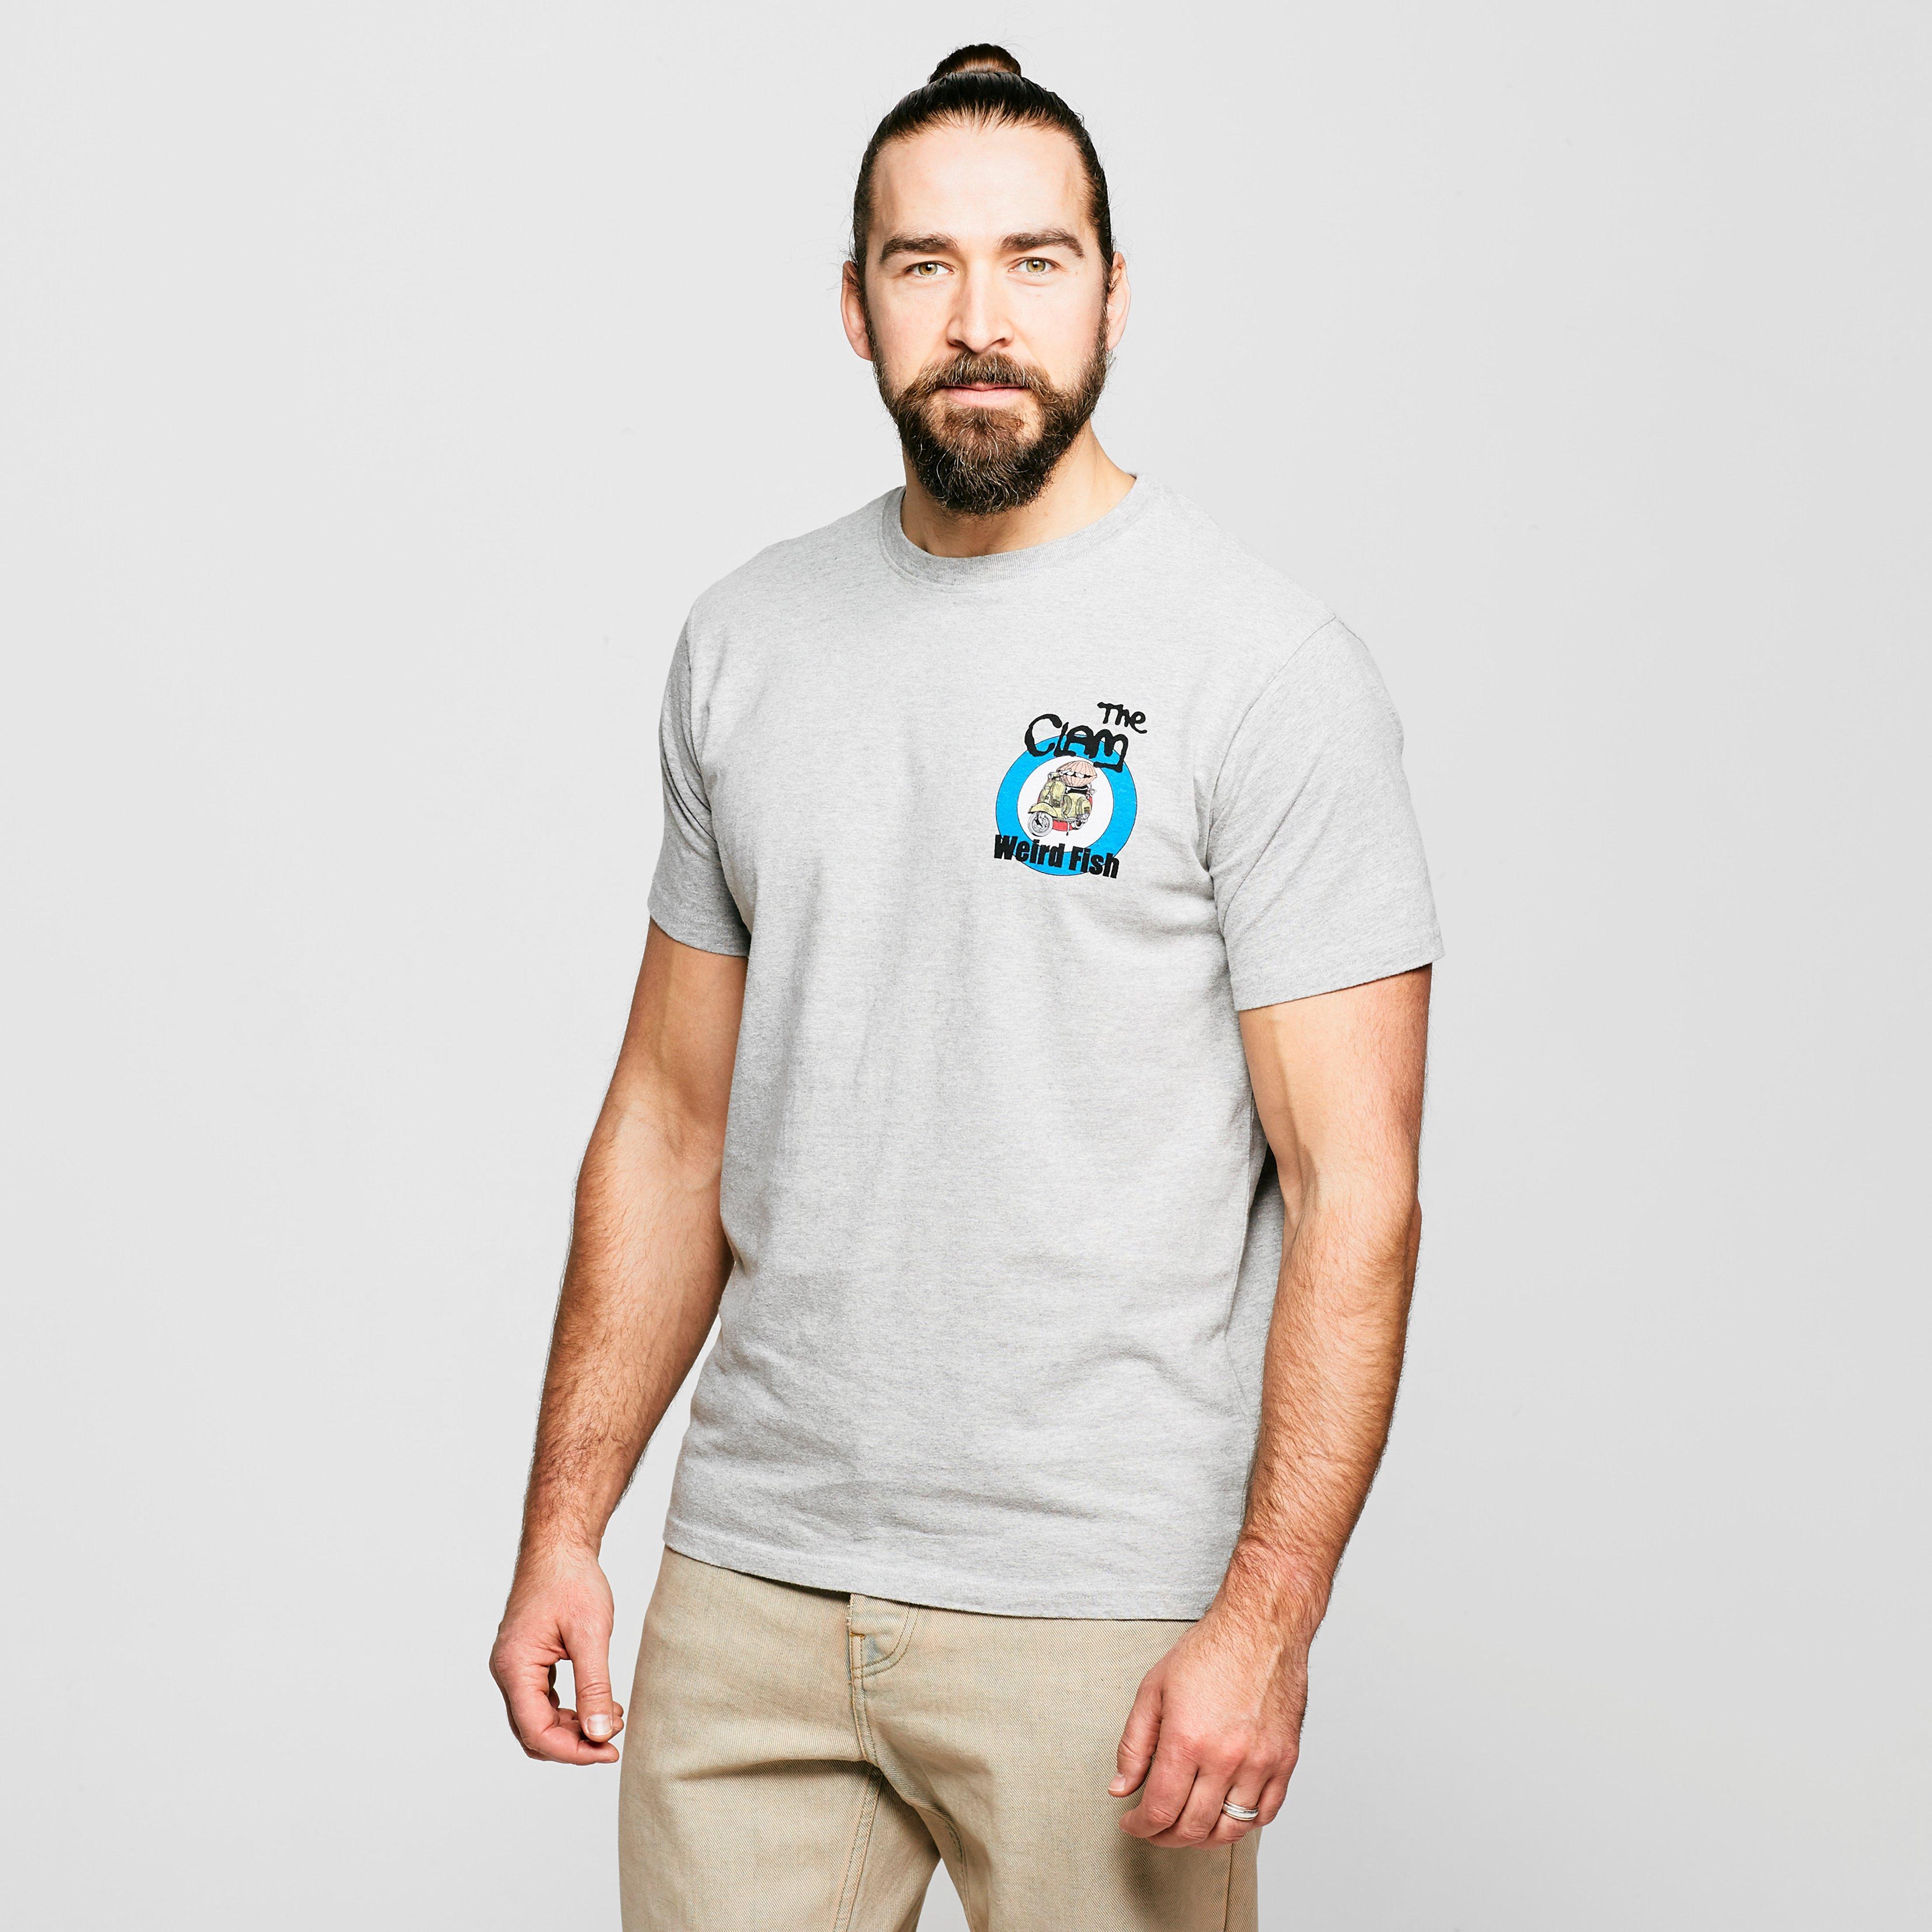 Weird Fish Mens The Clam Artist T-shirt - Grey/gry  Grey/gry